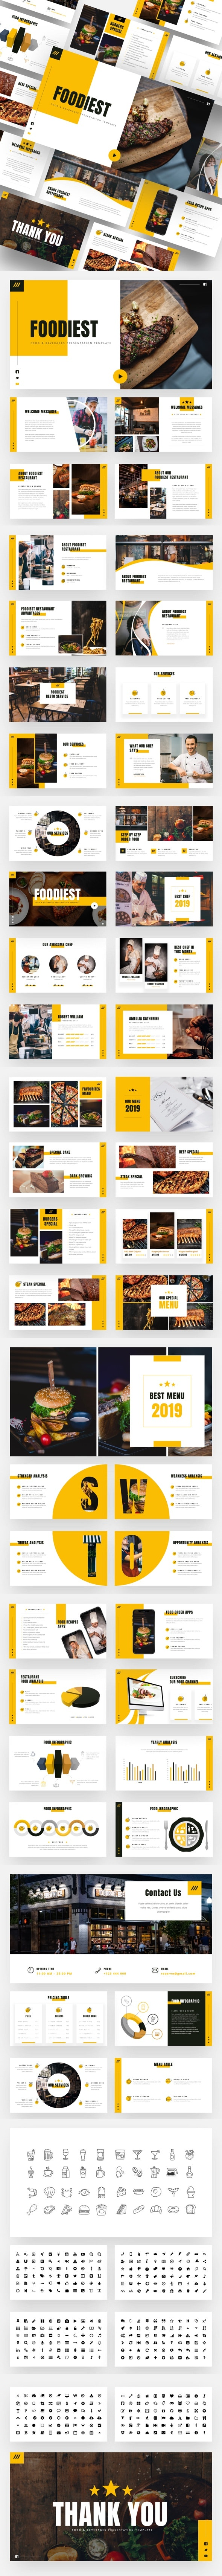 Foodist - Food &  Beverages Google Slides Template - Google Slides Presentation Templates